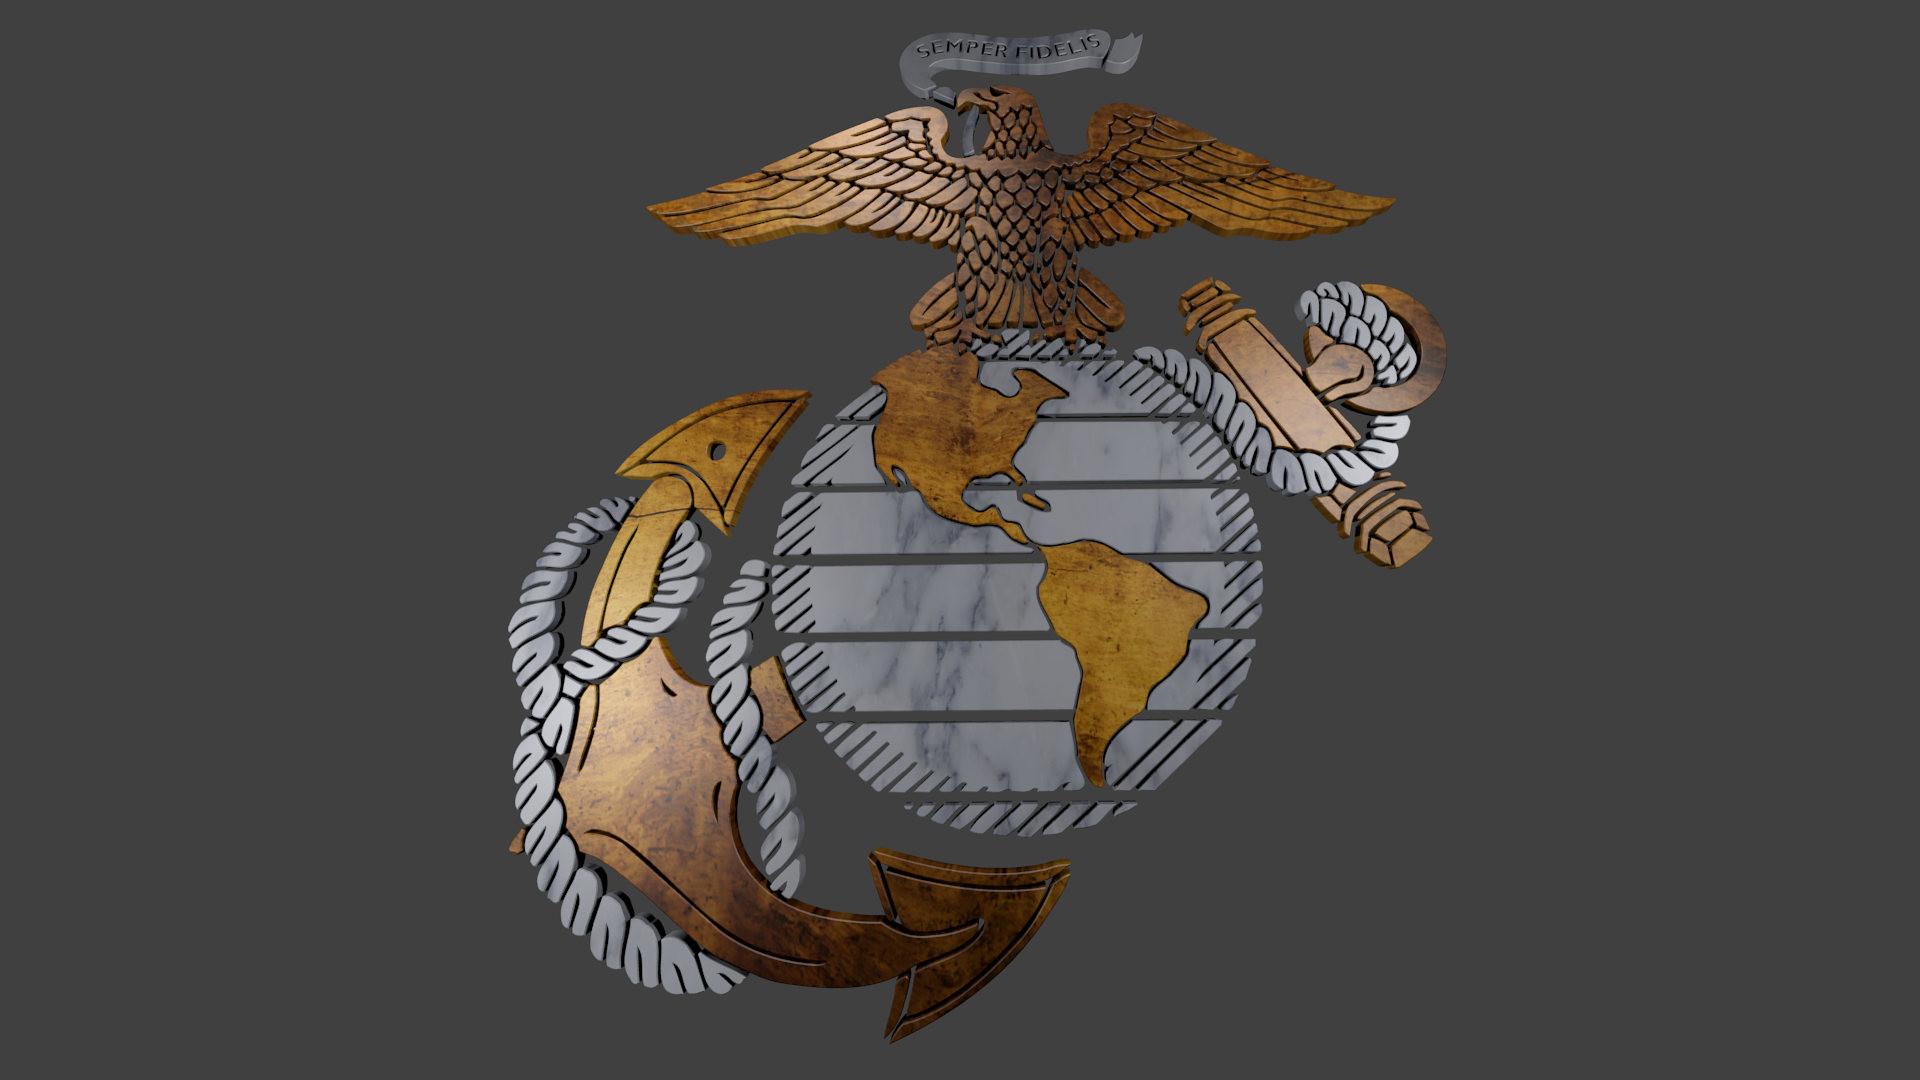 Marines USMC military wallpaper     46656   WallpaperUP